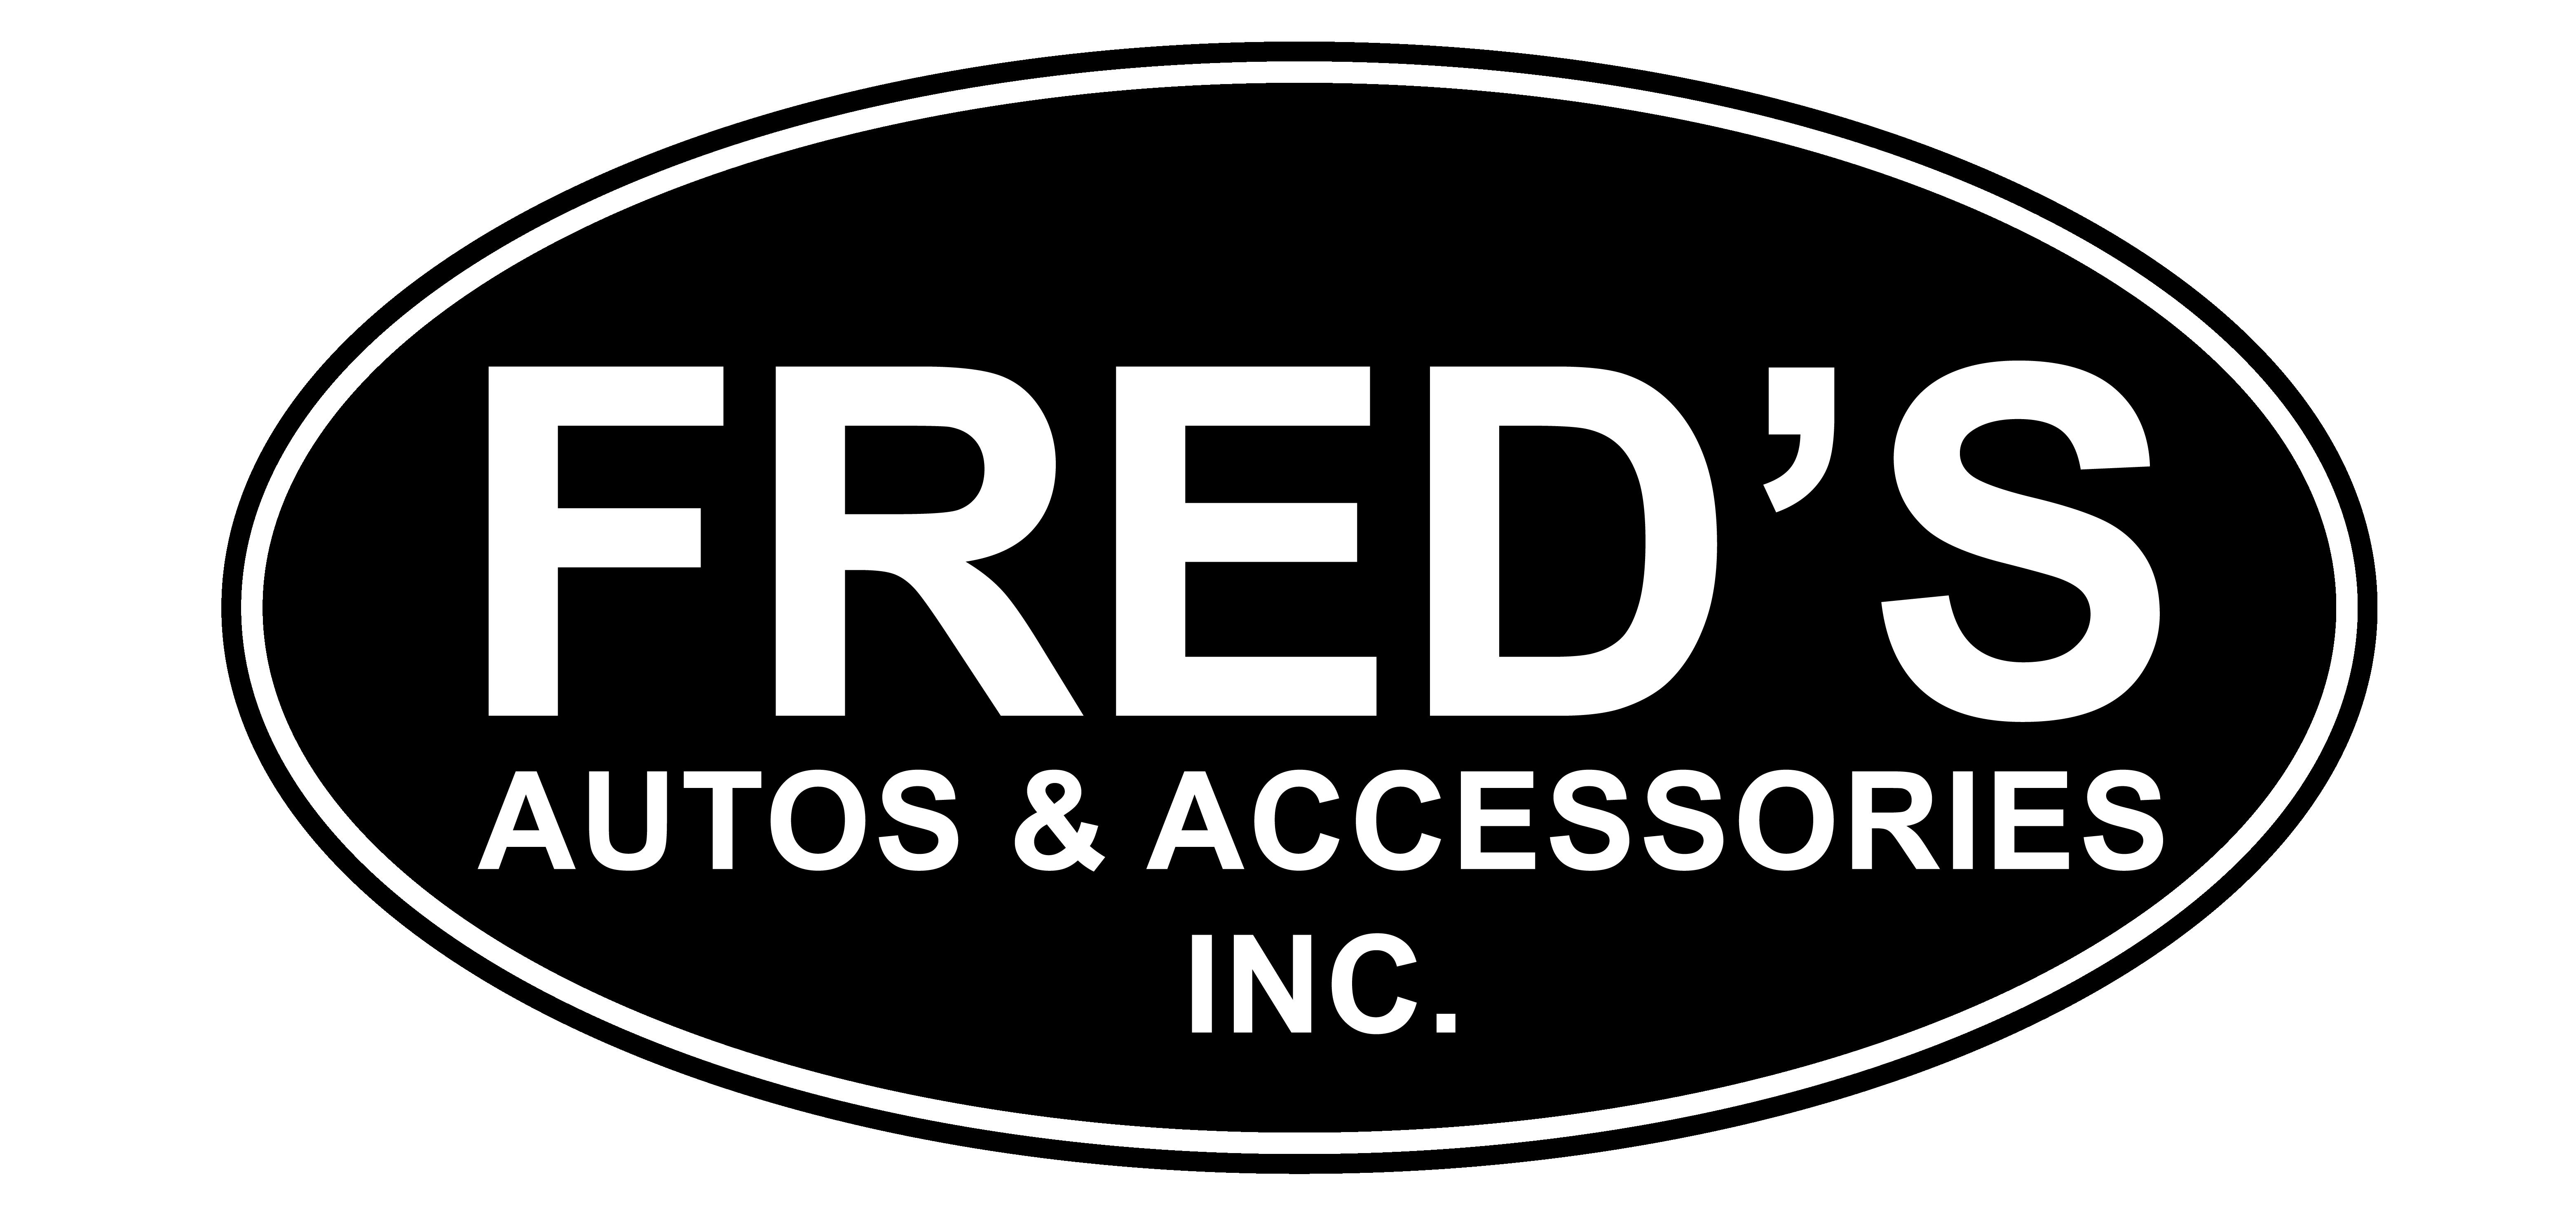 Truck Accessories Jacksonville FL